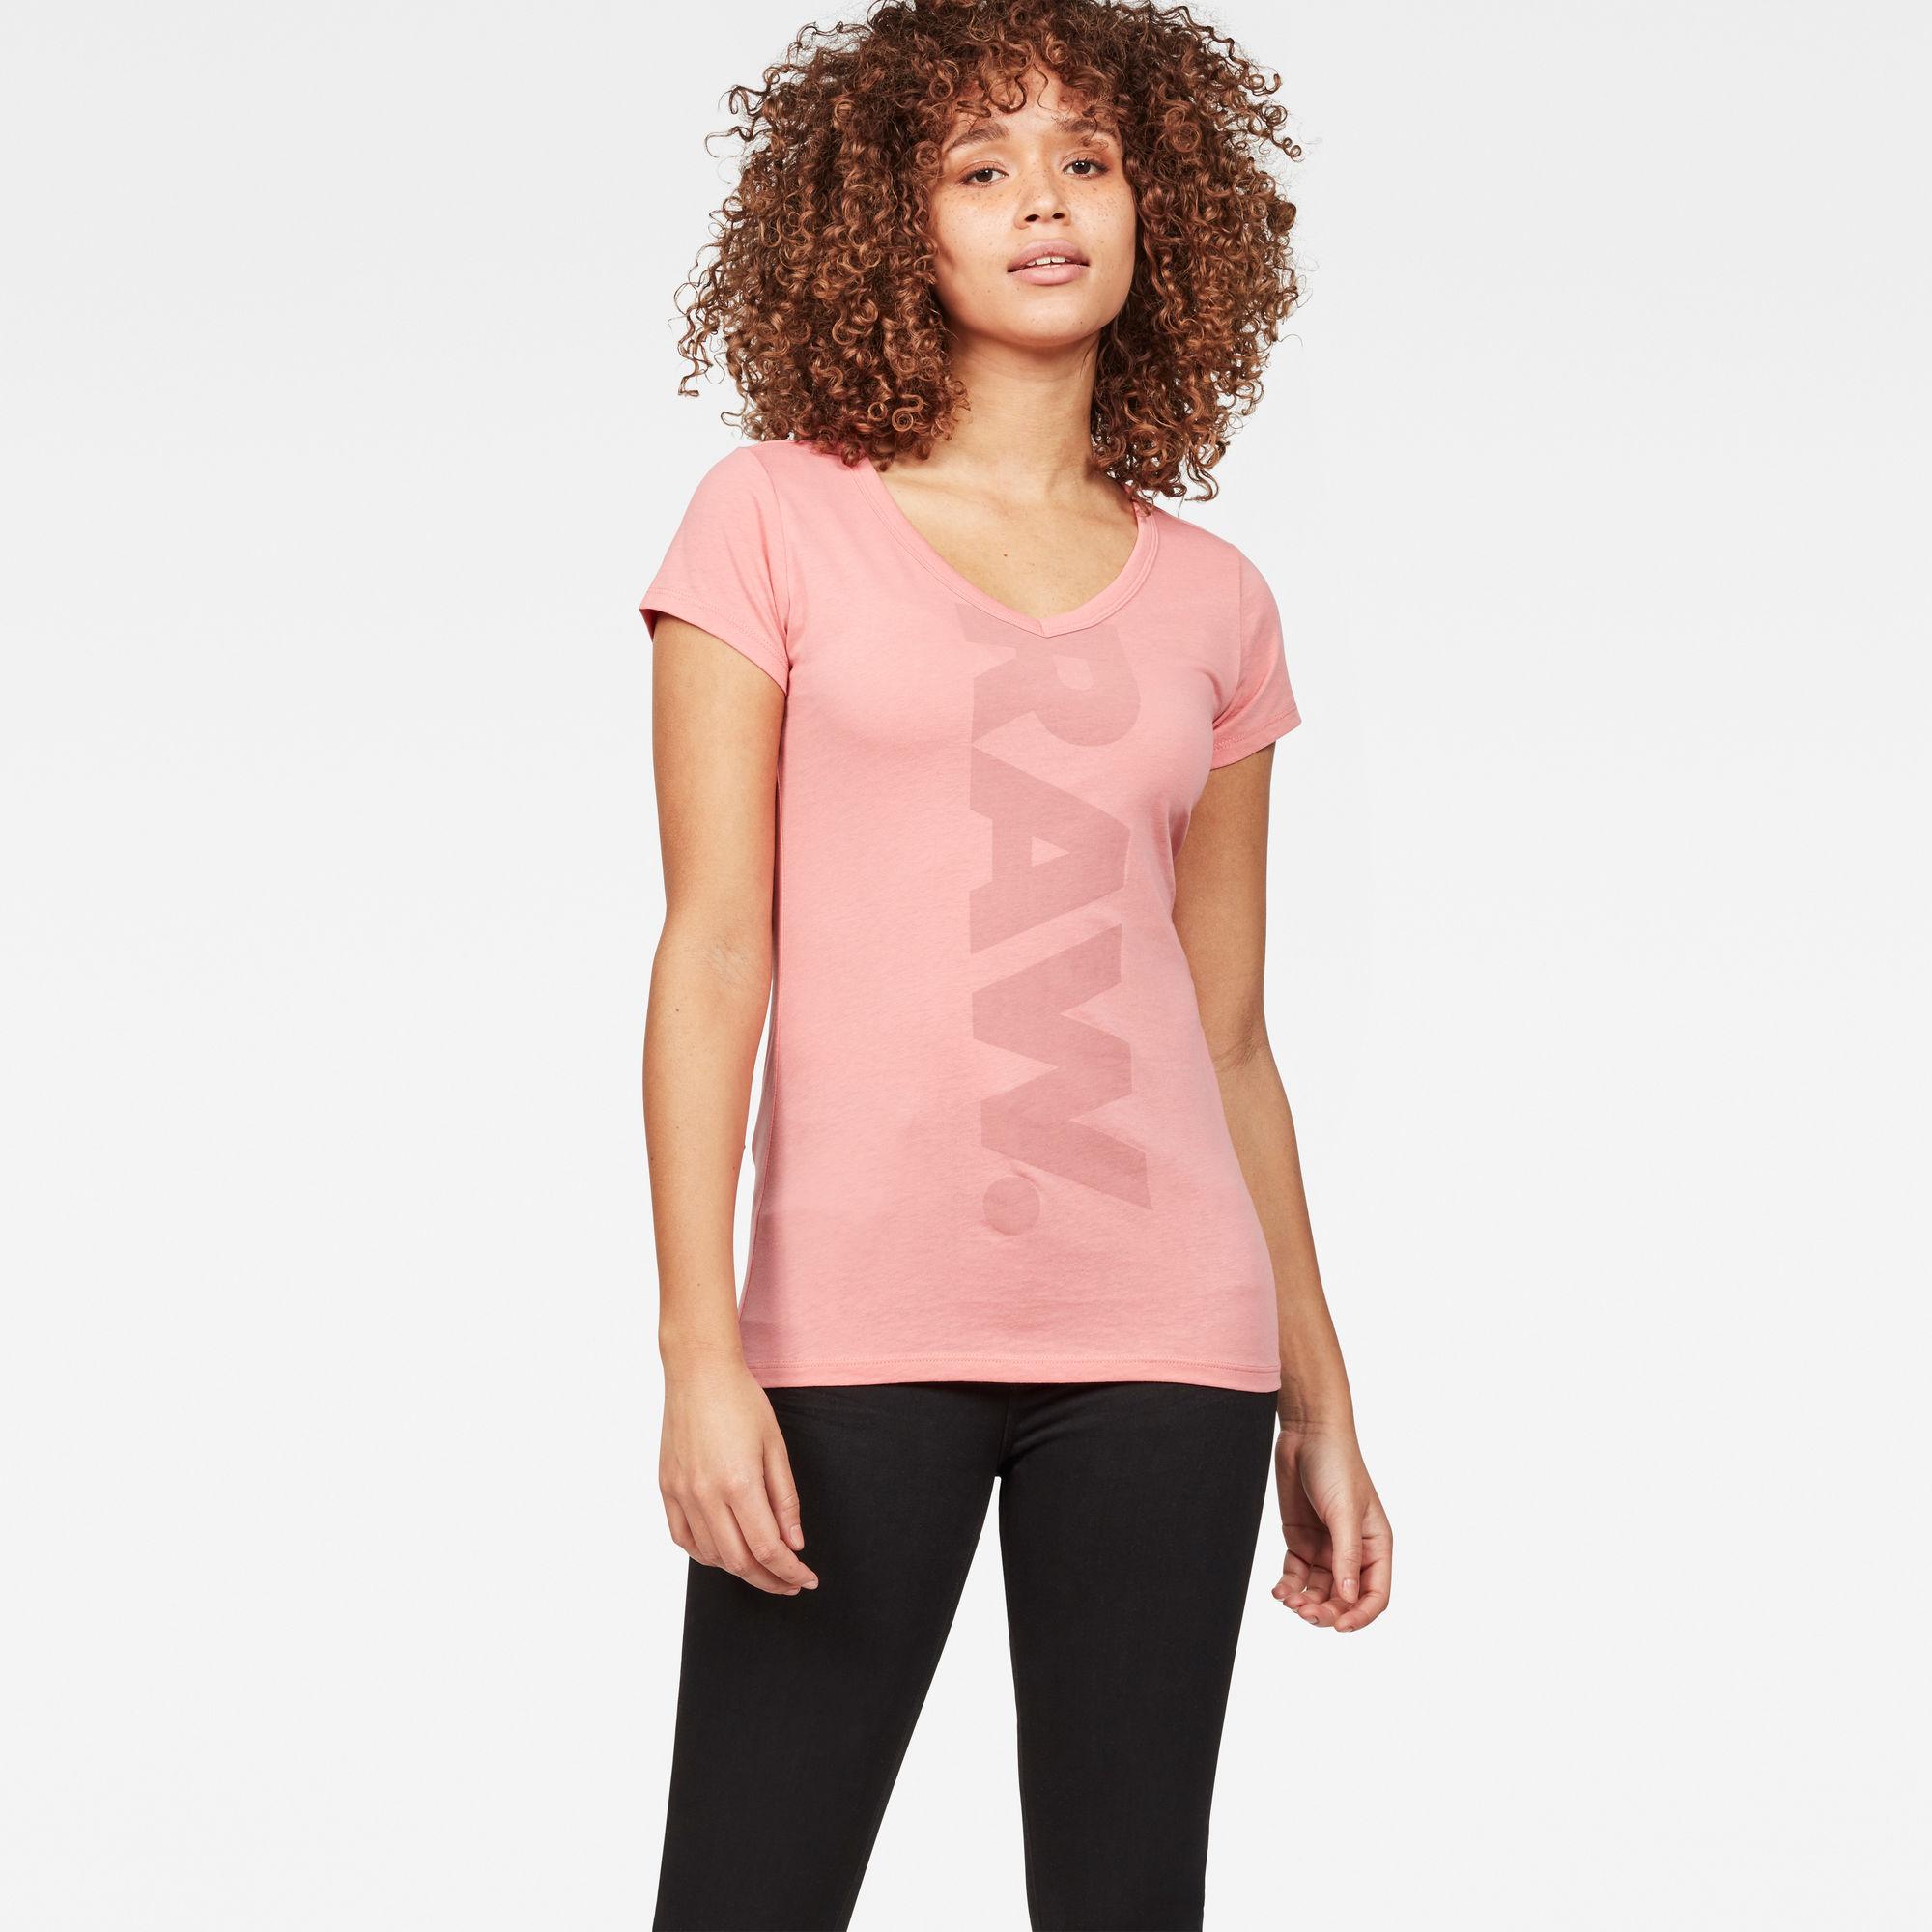 Image of G Star Raw Emoru Slim T-Shirt